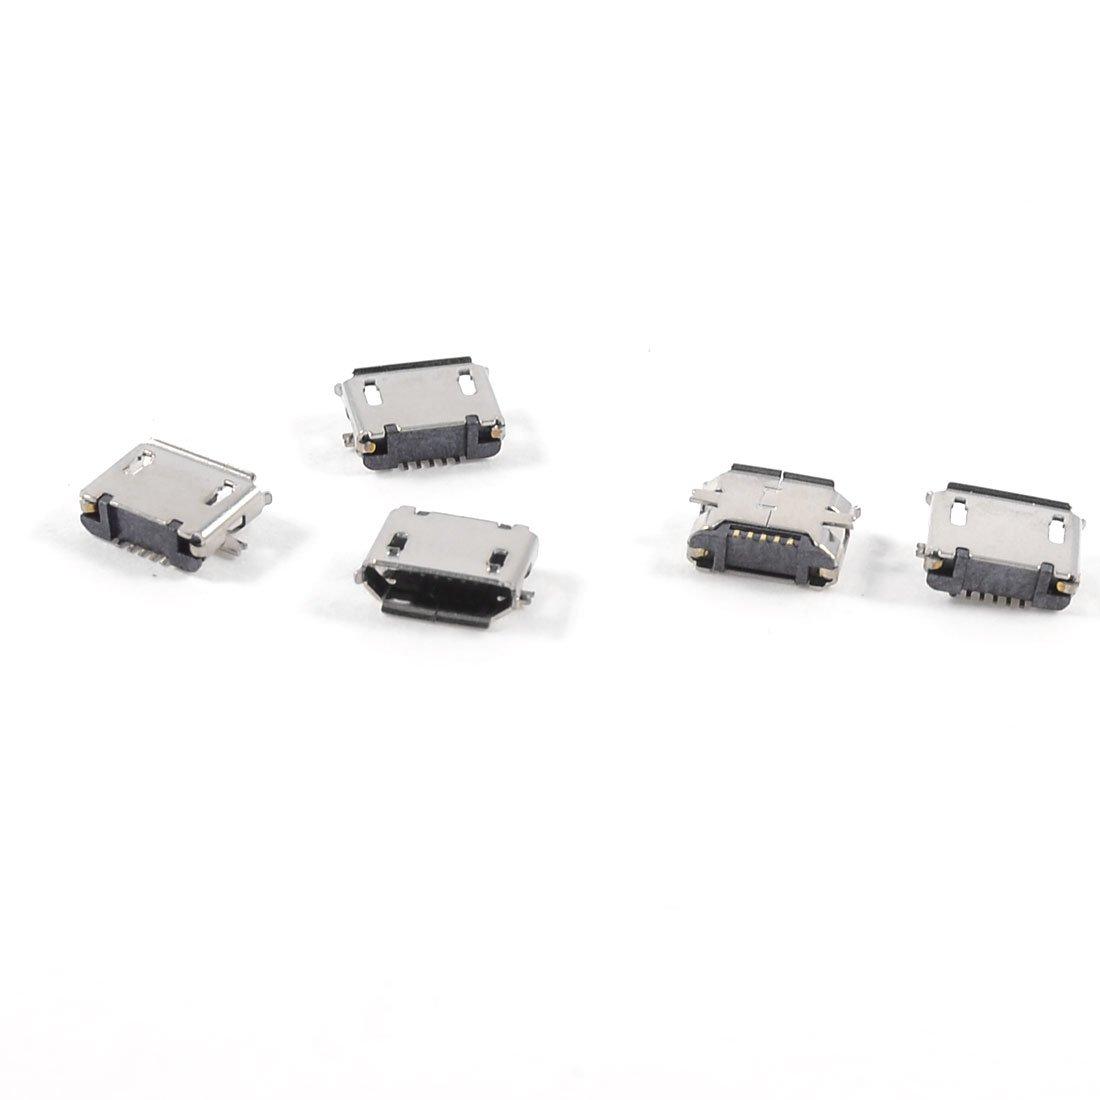 SZS Hot 5pcs USB Micro Type-B 5pin Female Jack Connector SMT Surface Mount(China (Mainland))